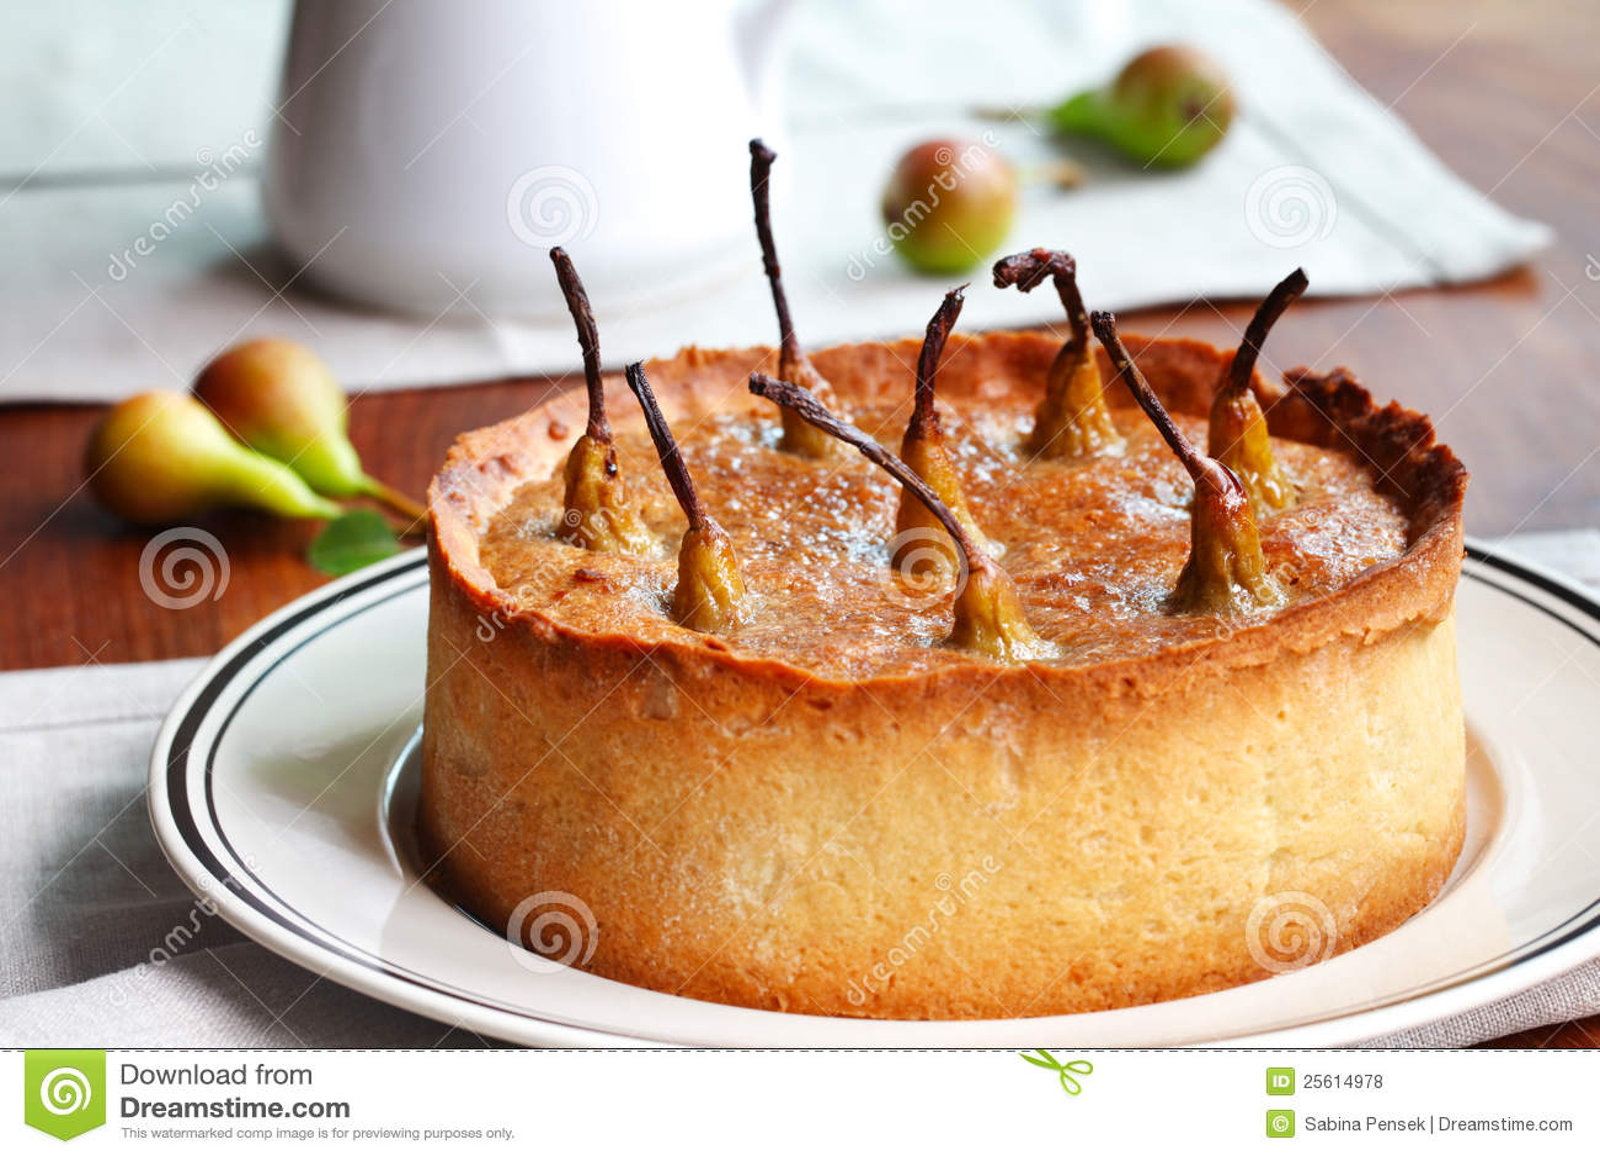 Torta da pera, pastelaria caseiro do prato profundo